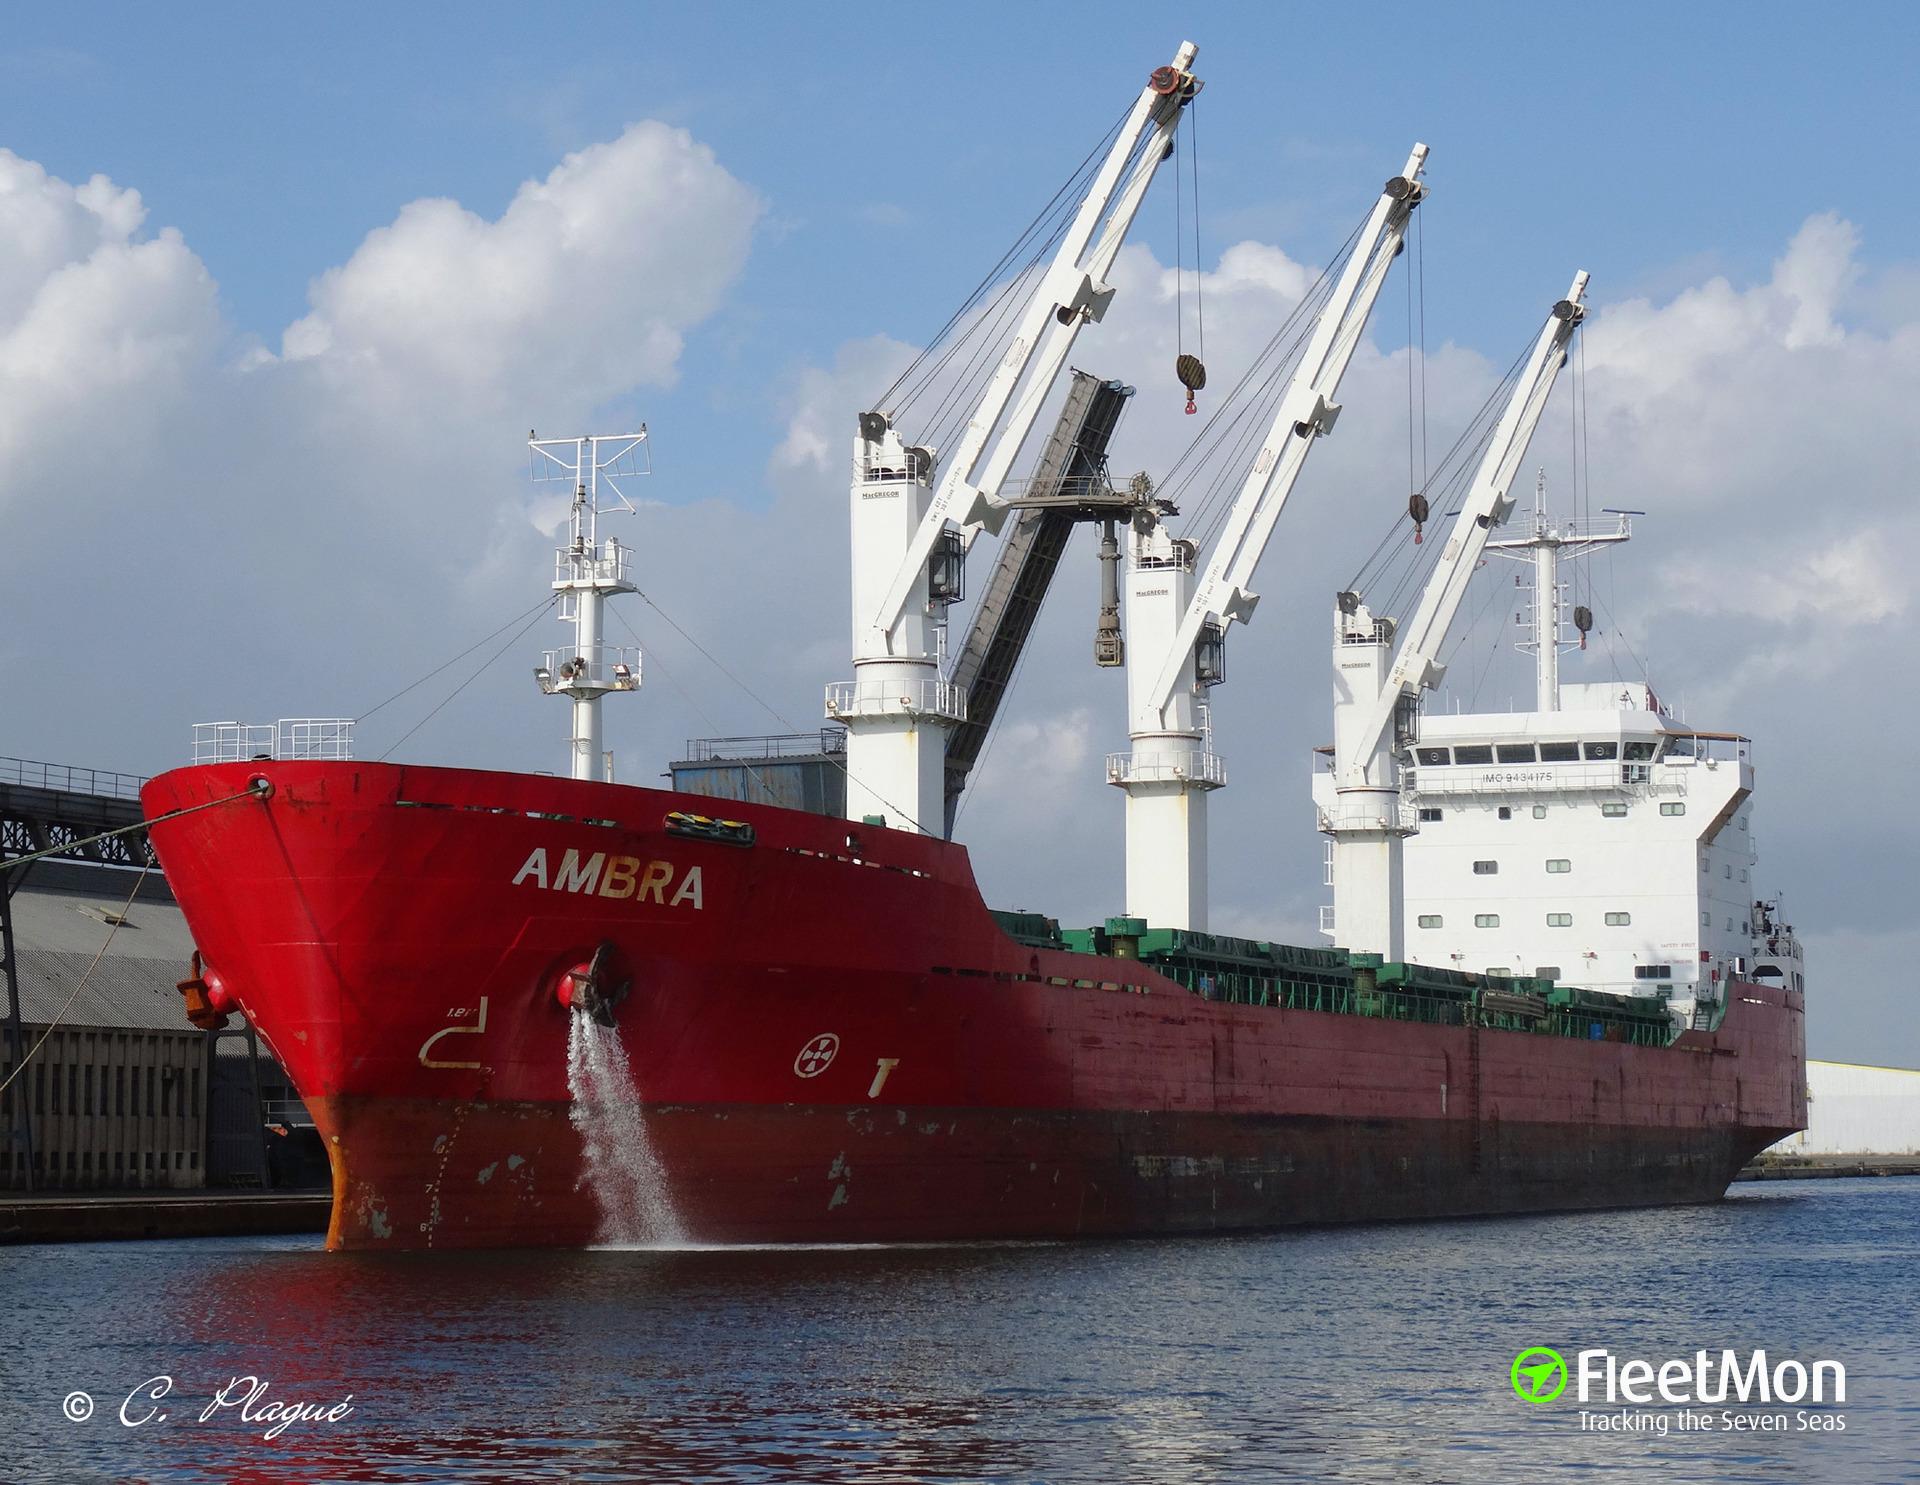 Freighter Ambra towed through Bosphorus